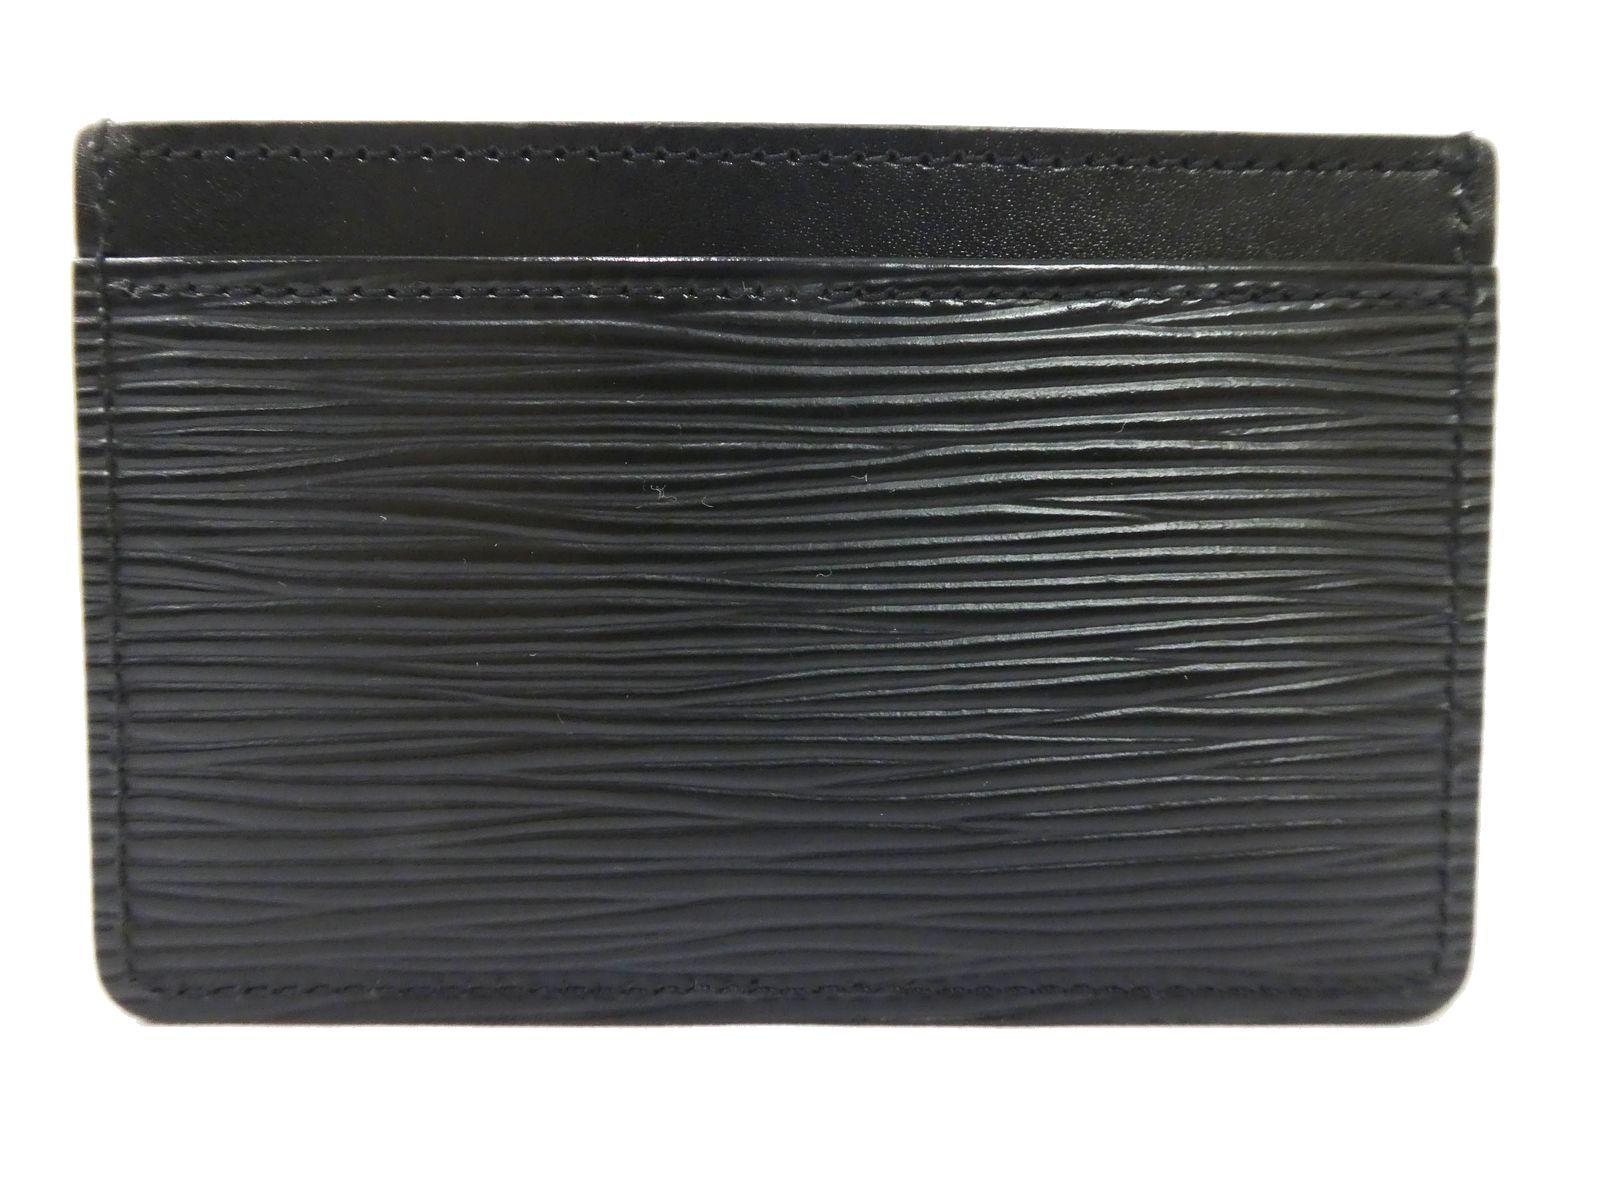 f7a2d87338359 Details about Auth LOUIS VUITTON Epi Leather Pass Case Card Holder Black  Unused A1478